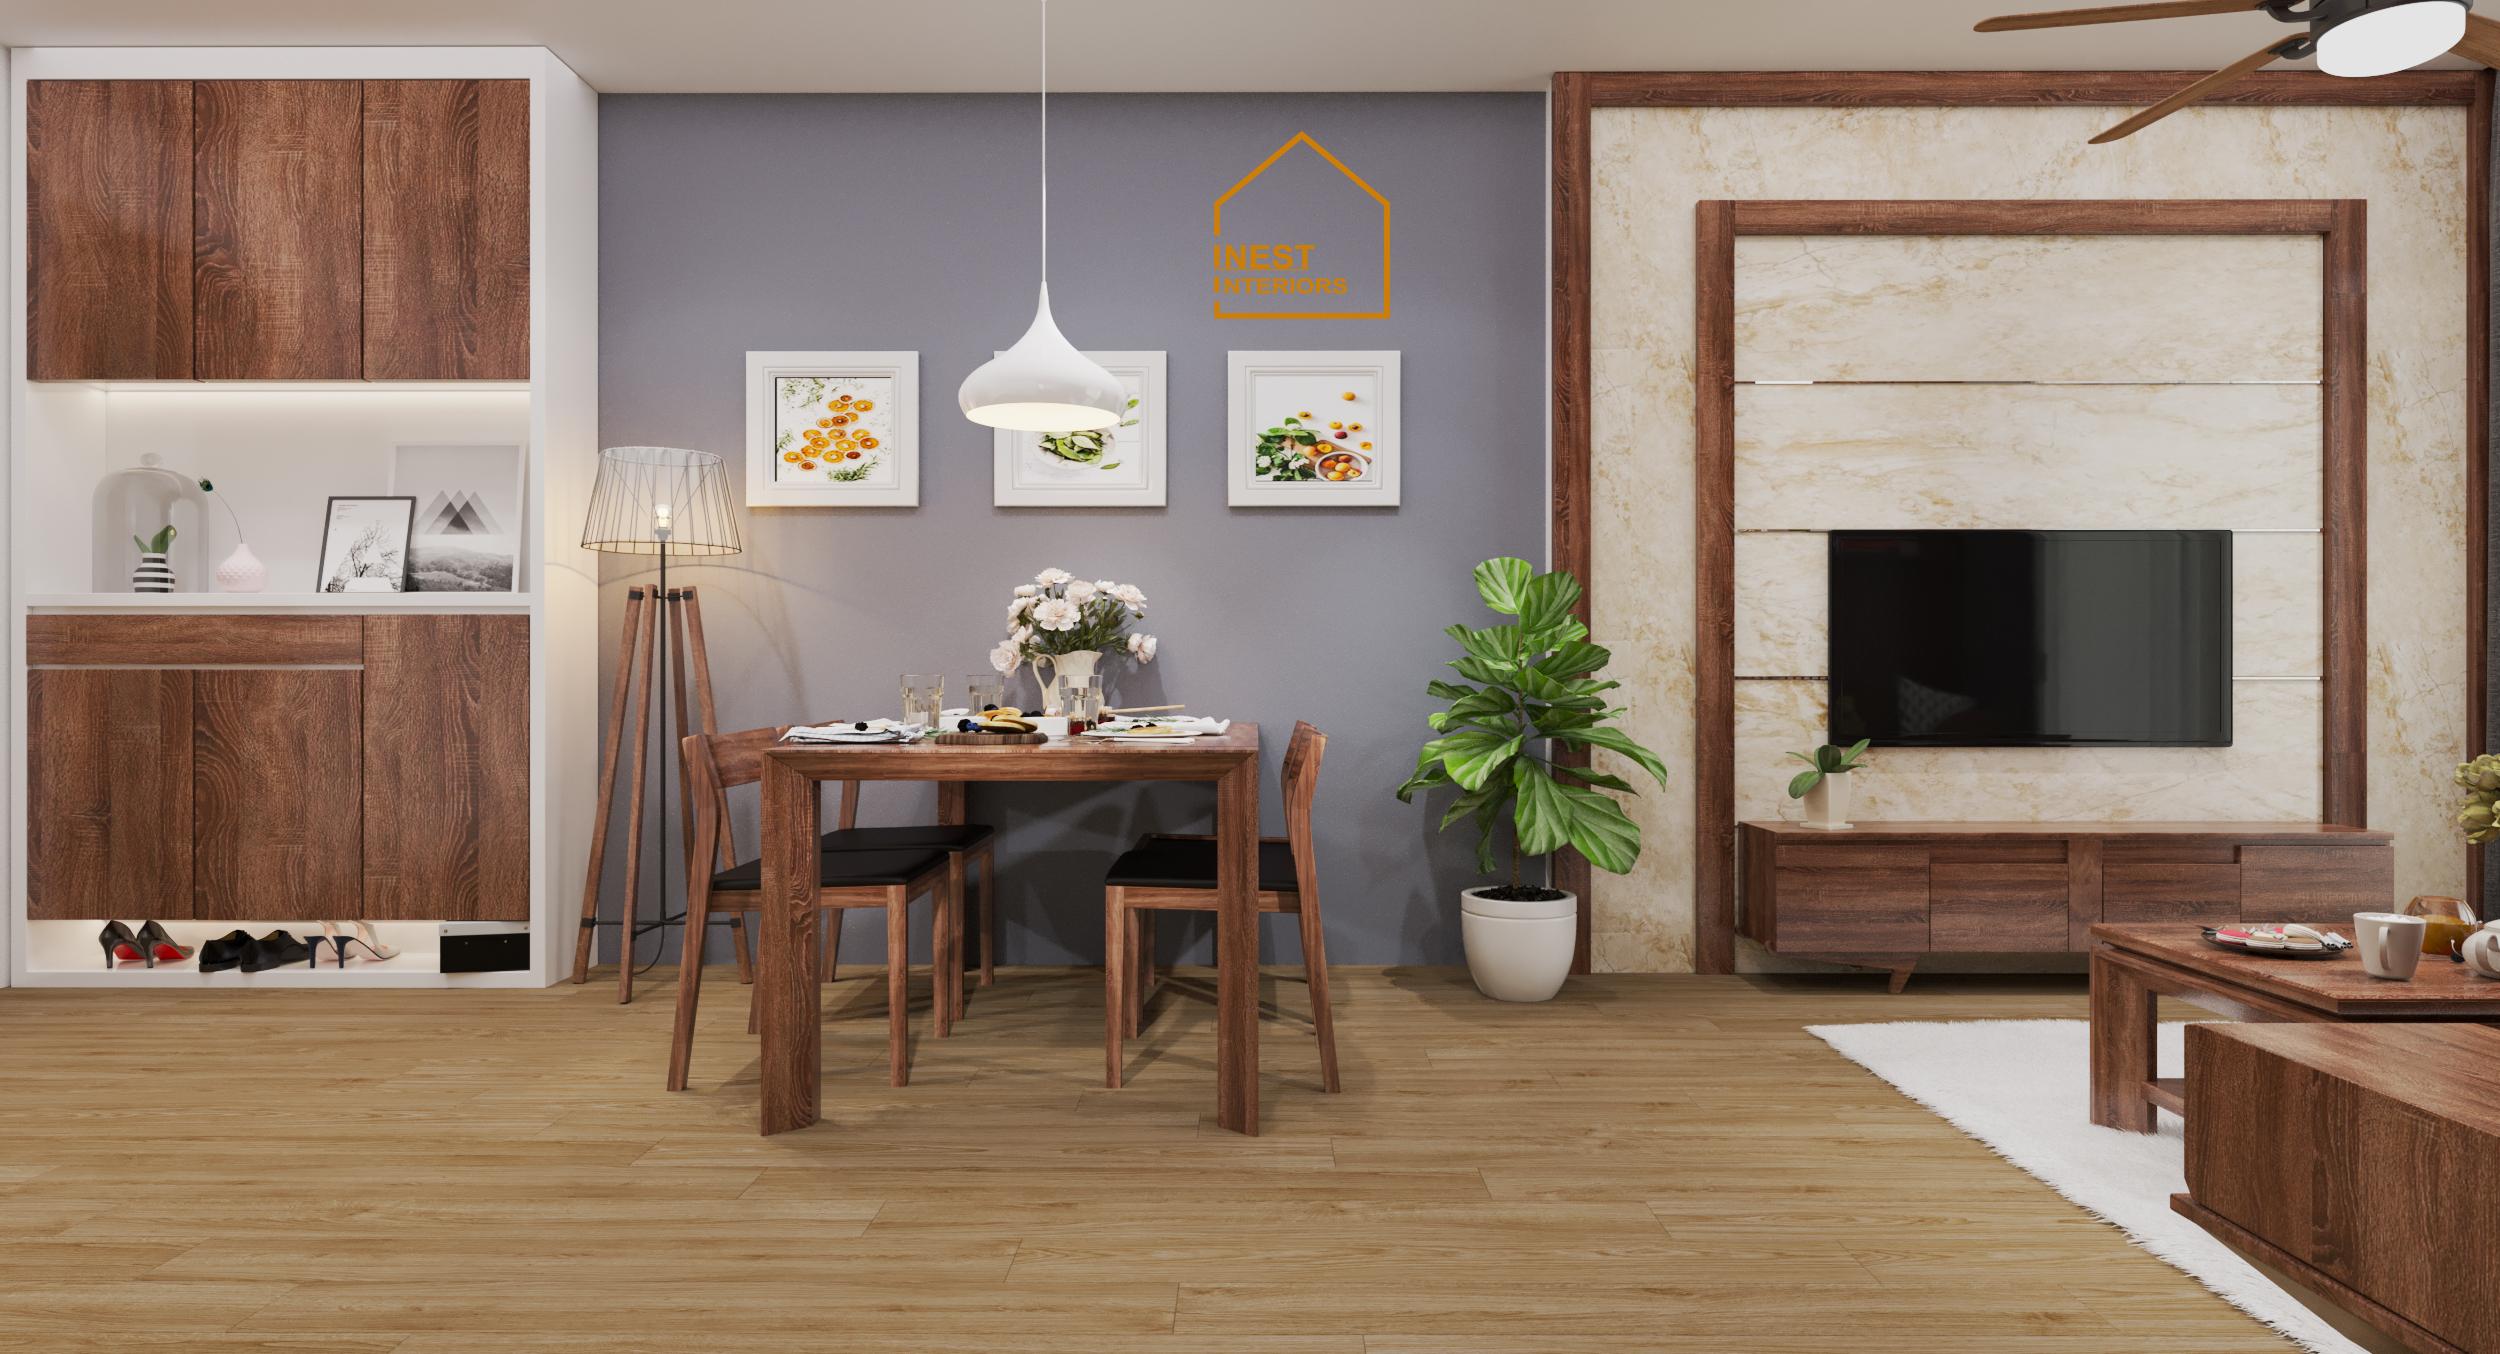 Nội thất căn hộ vinhome smartcity